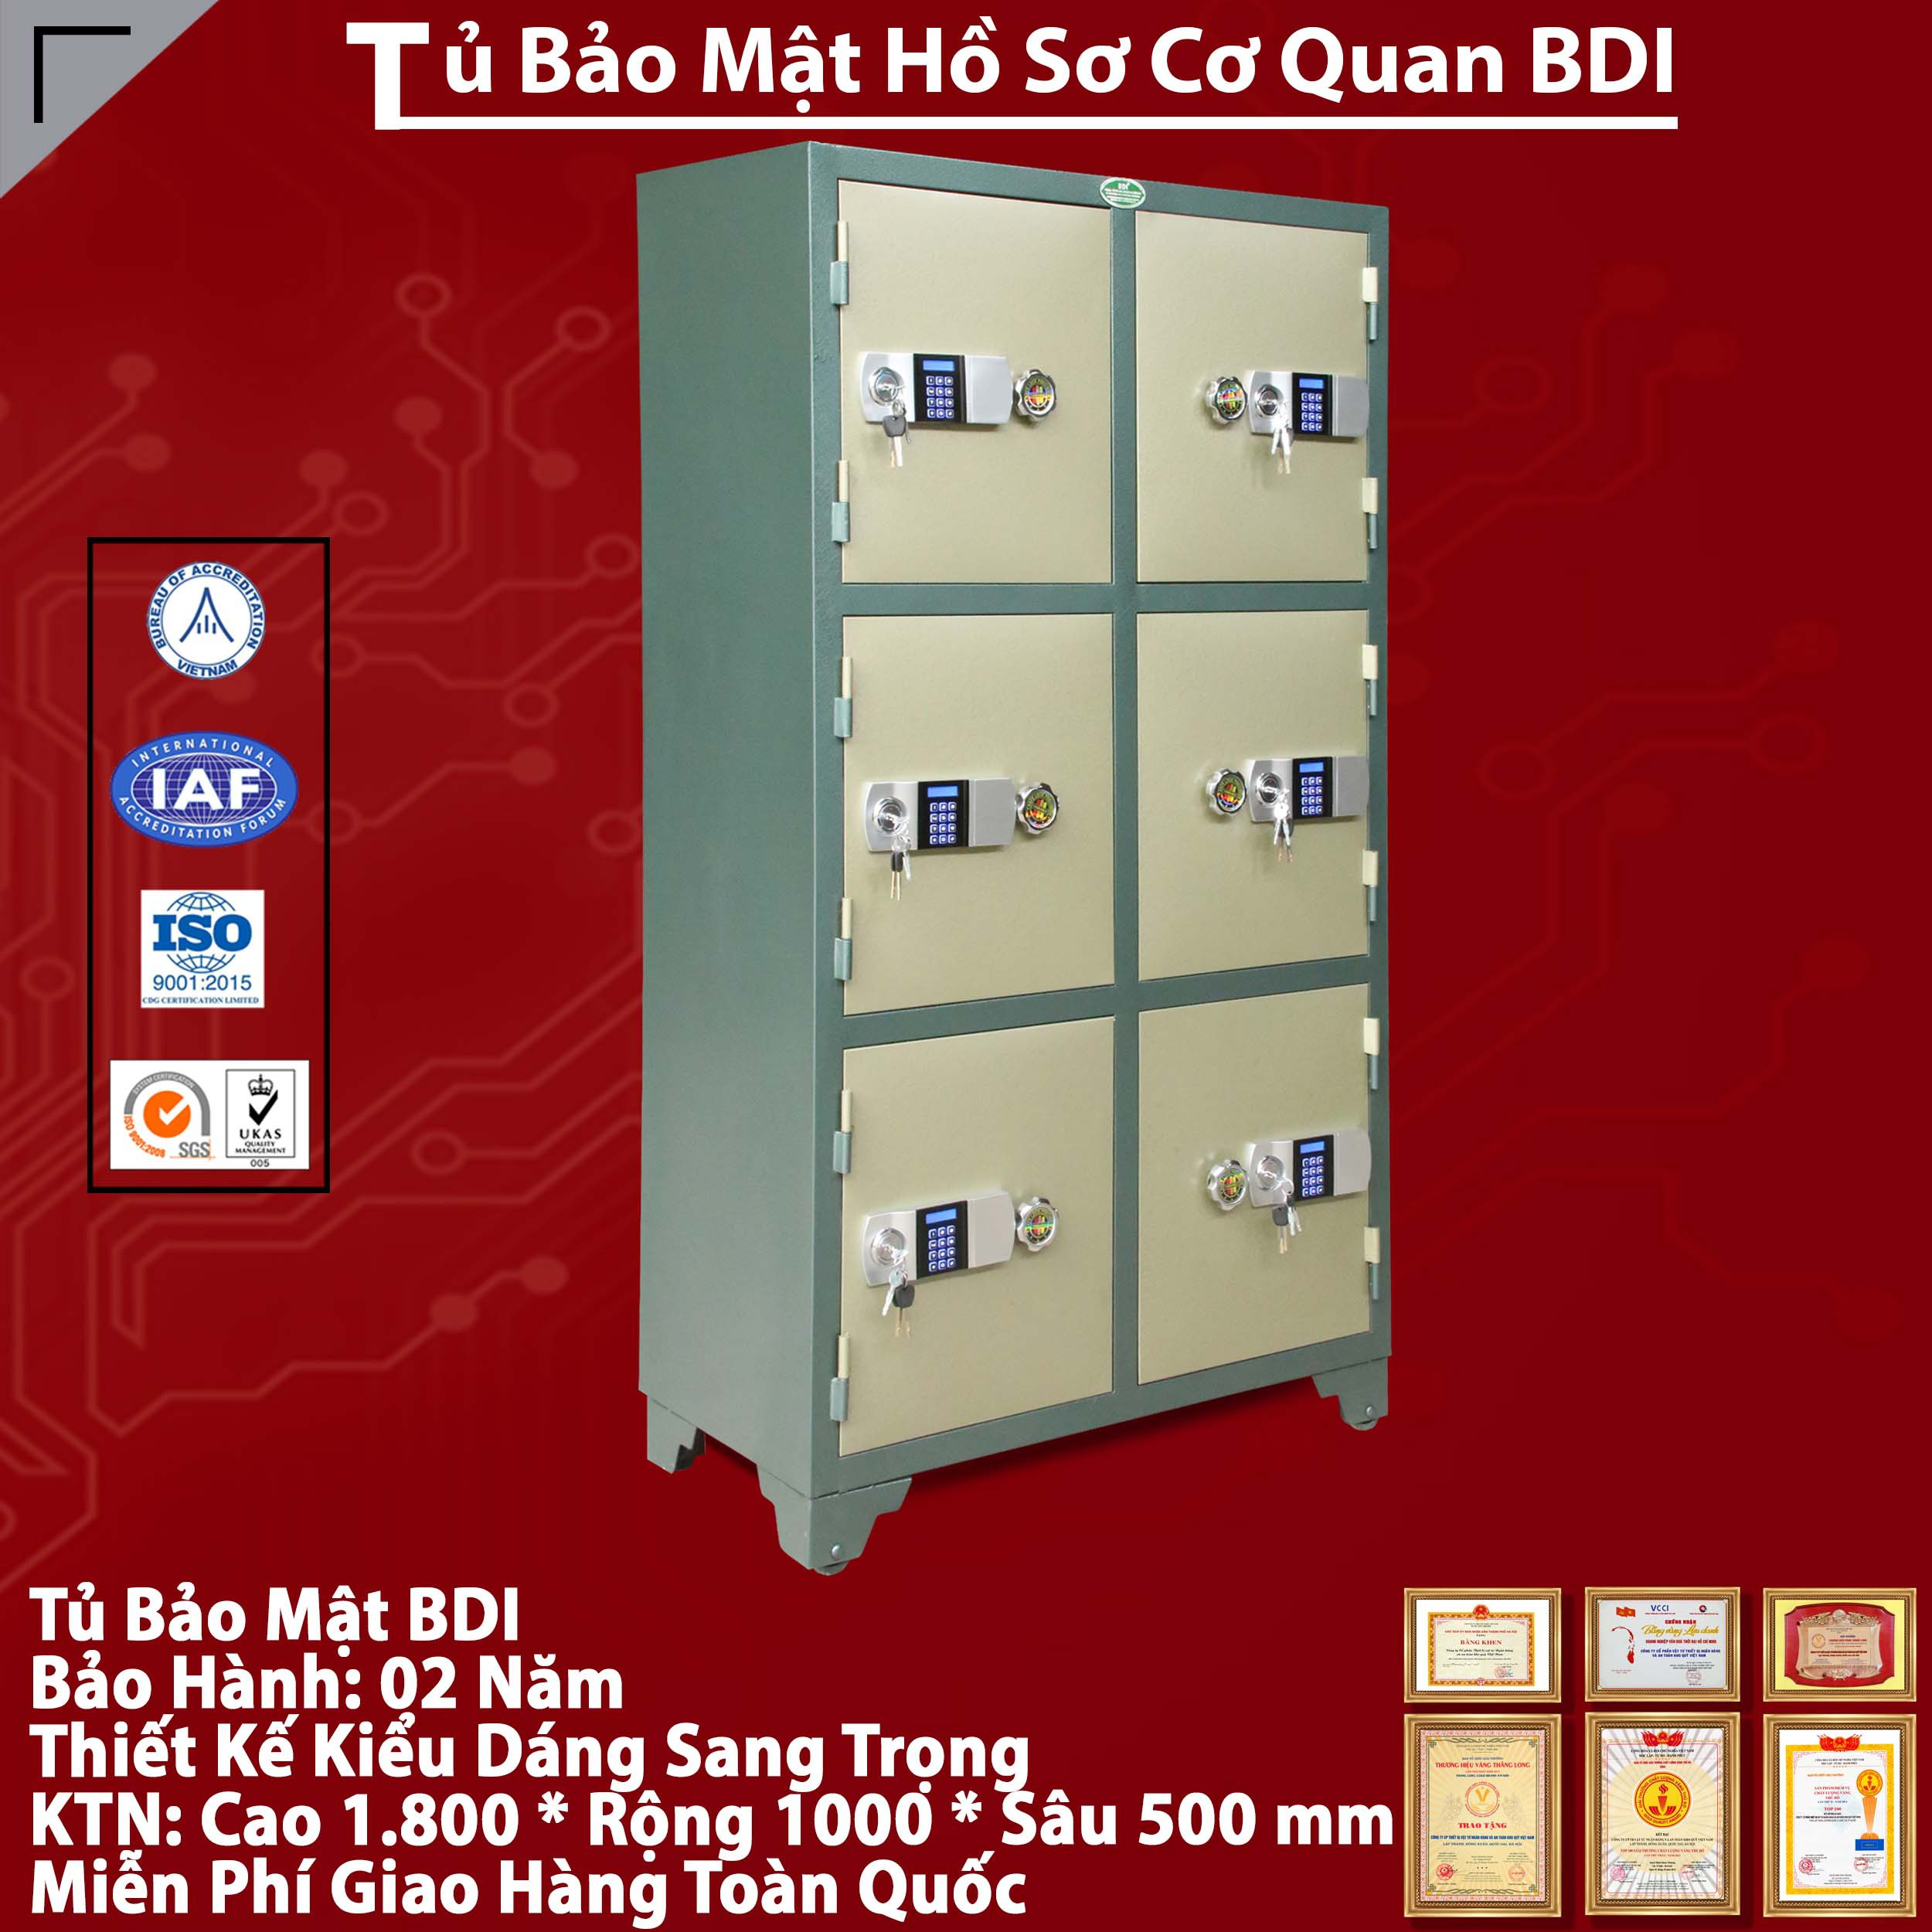 Tu Bao Mat 6 Canh Hien Dai Cao Cap